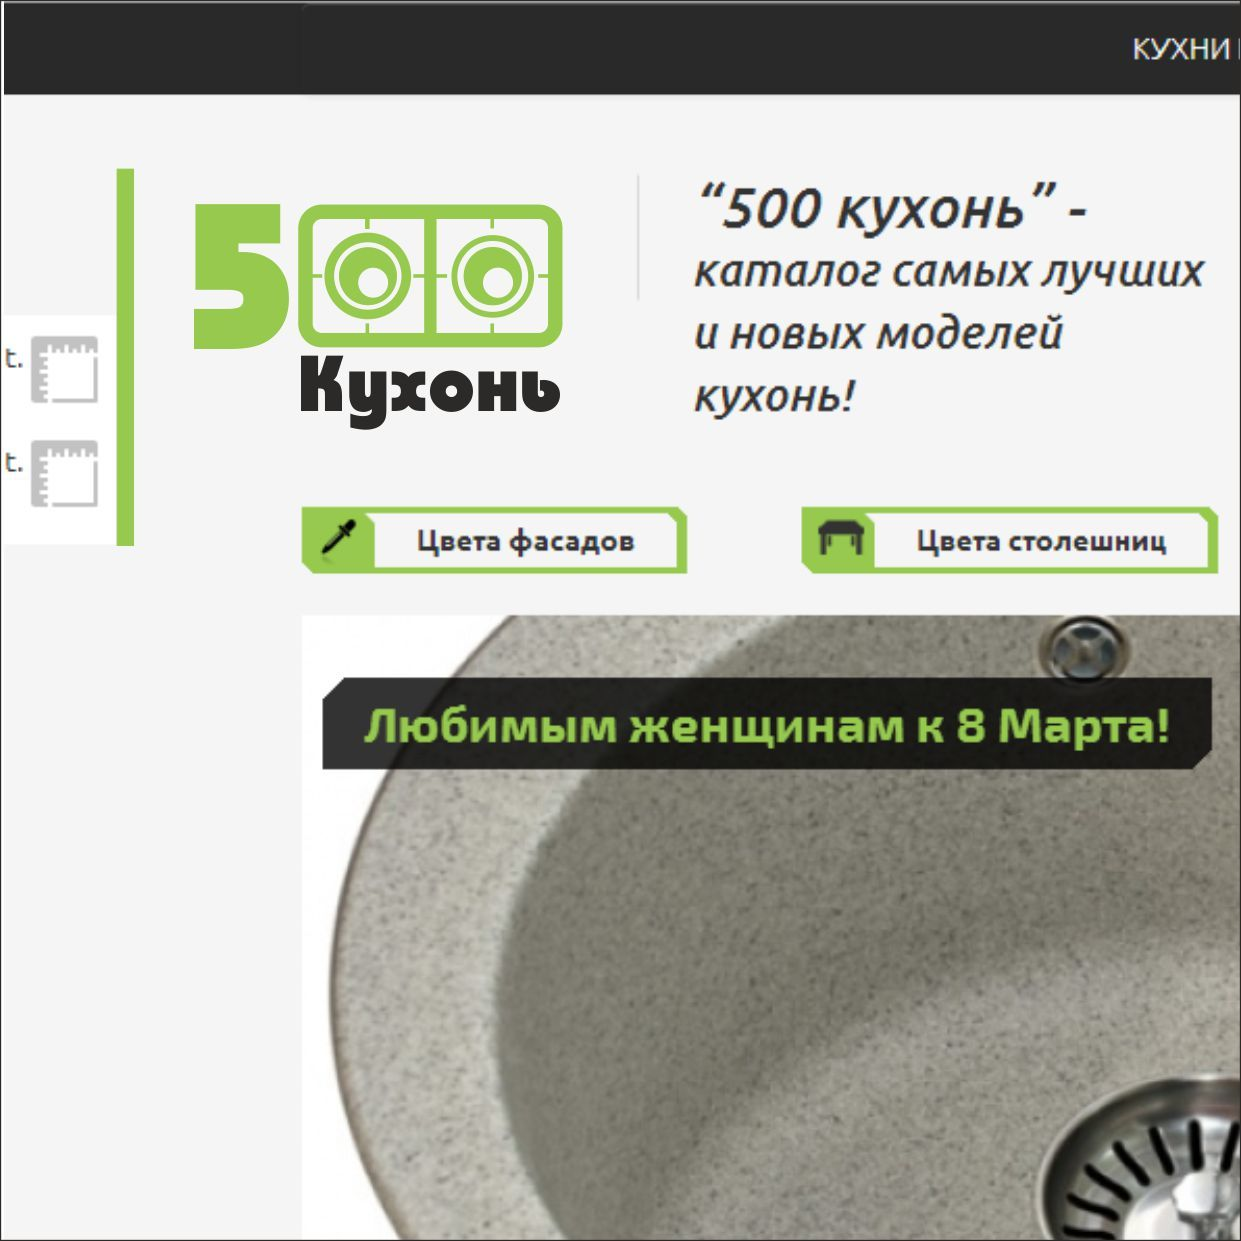 Логотип для интернет каталога кухонь - дизайнер Darkmarshal